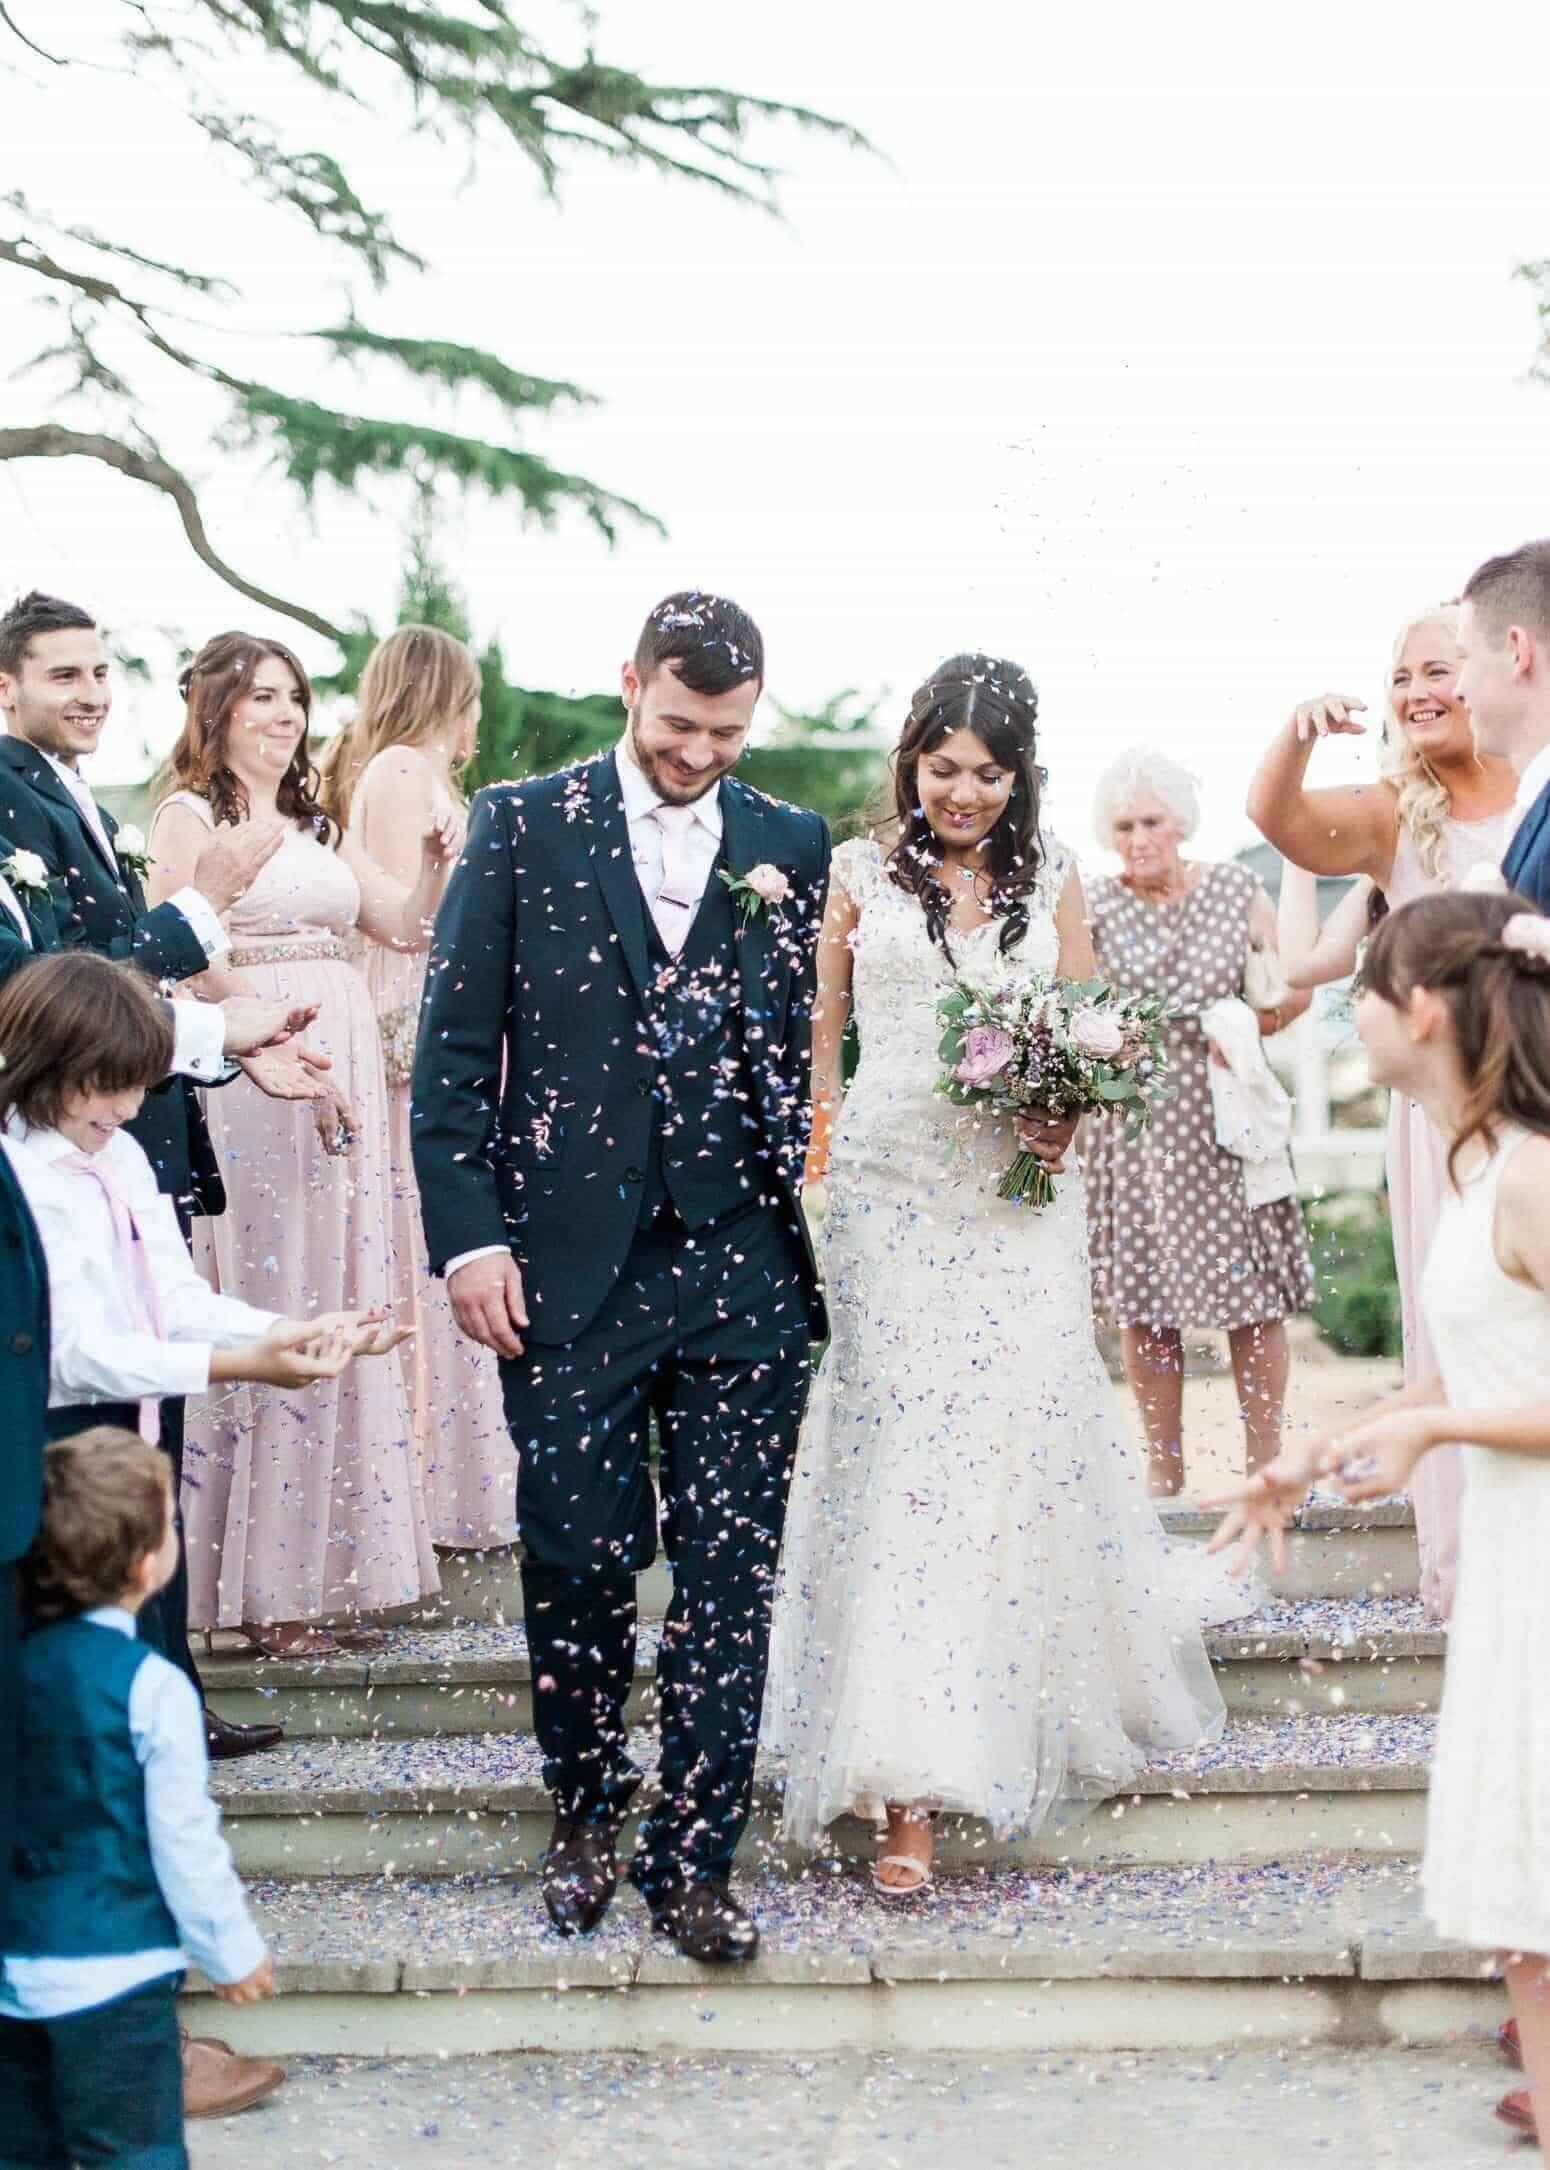 Kate Nielen Photography 228 - Luxury Wedding Gallery